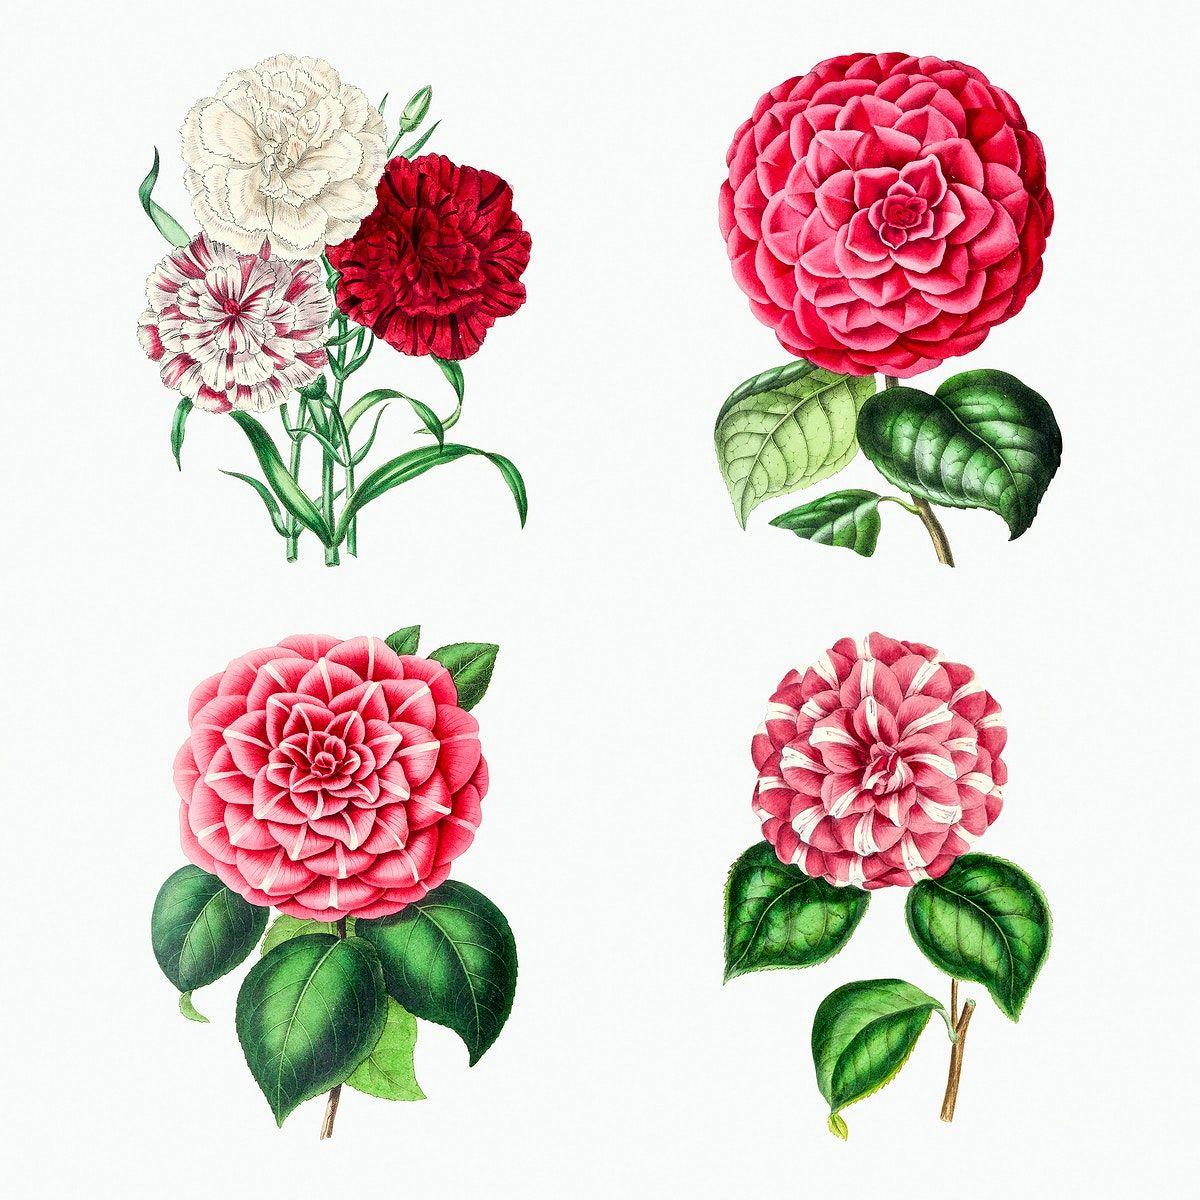 Download Premium Illustration Of Hand Drawn Camellia Flower Design Element In 2020 Design Element Camellia Flower Botanical Illustration Vintage